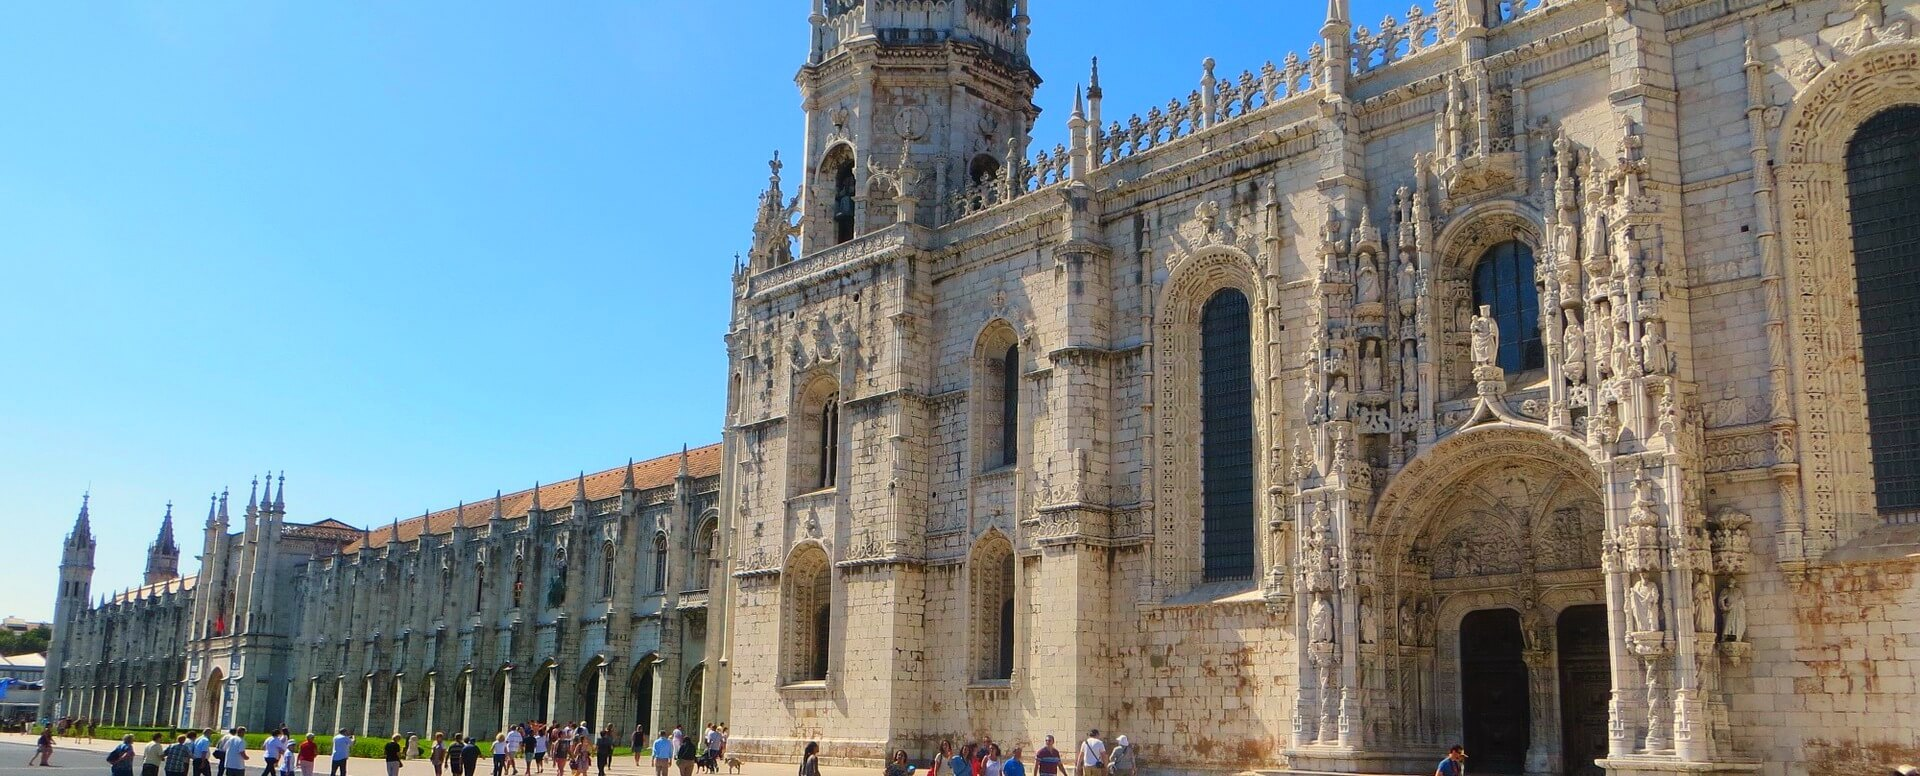 8. Jerónimos Monastery - Lisbon